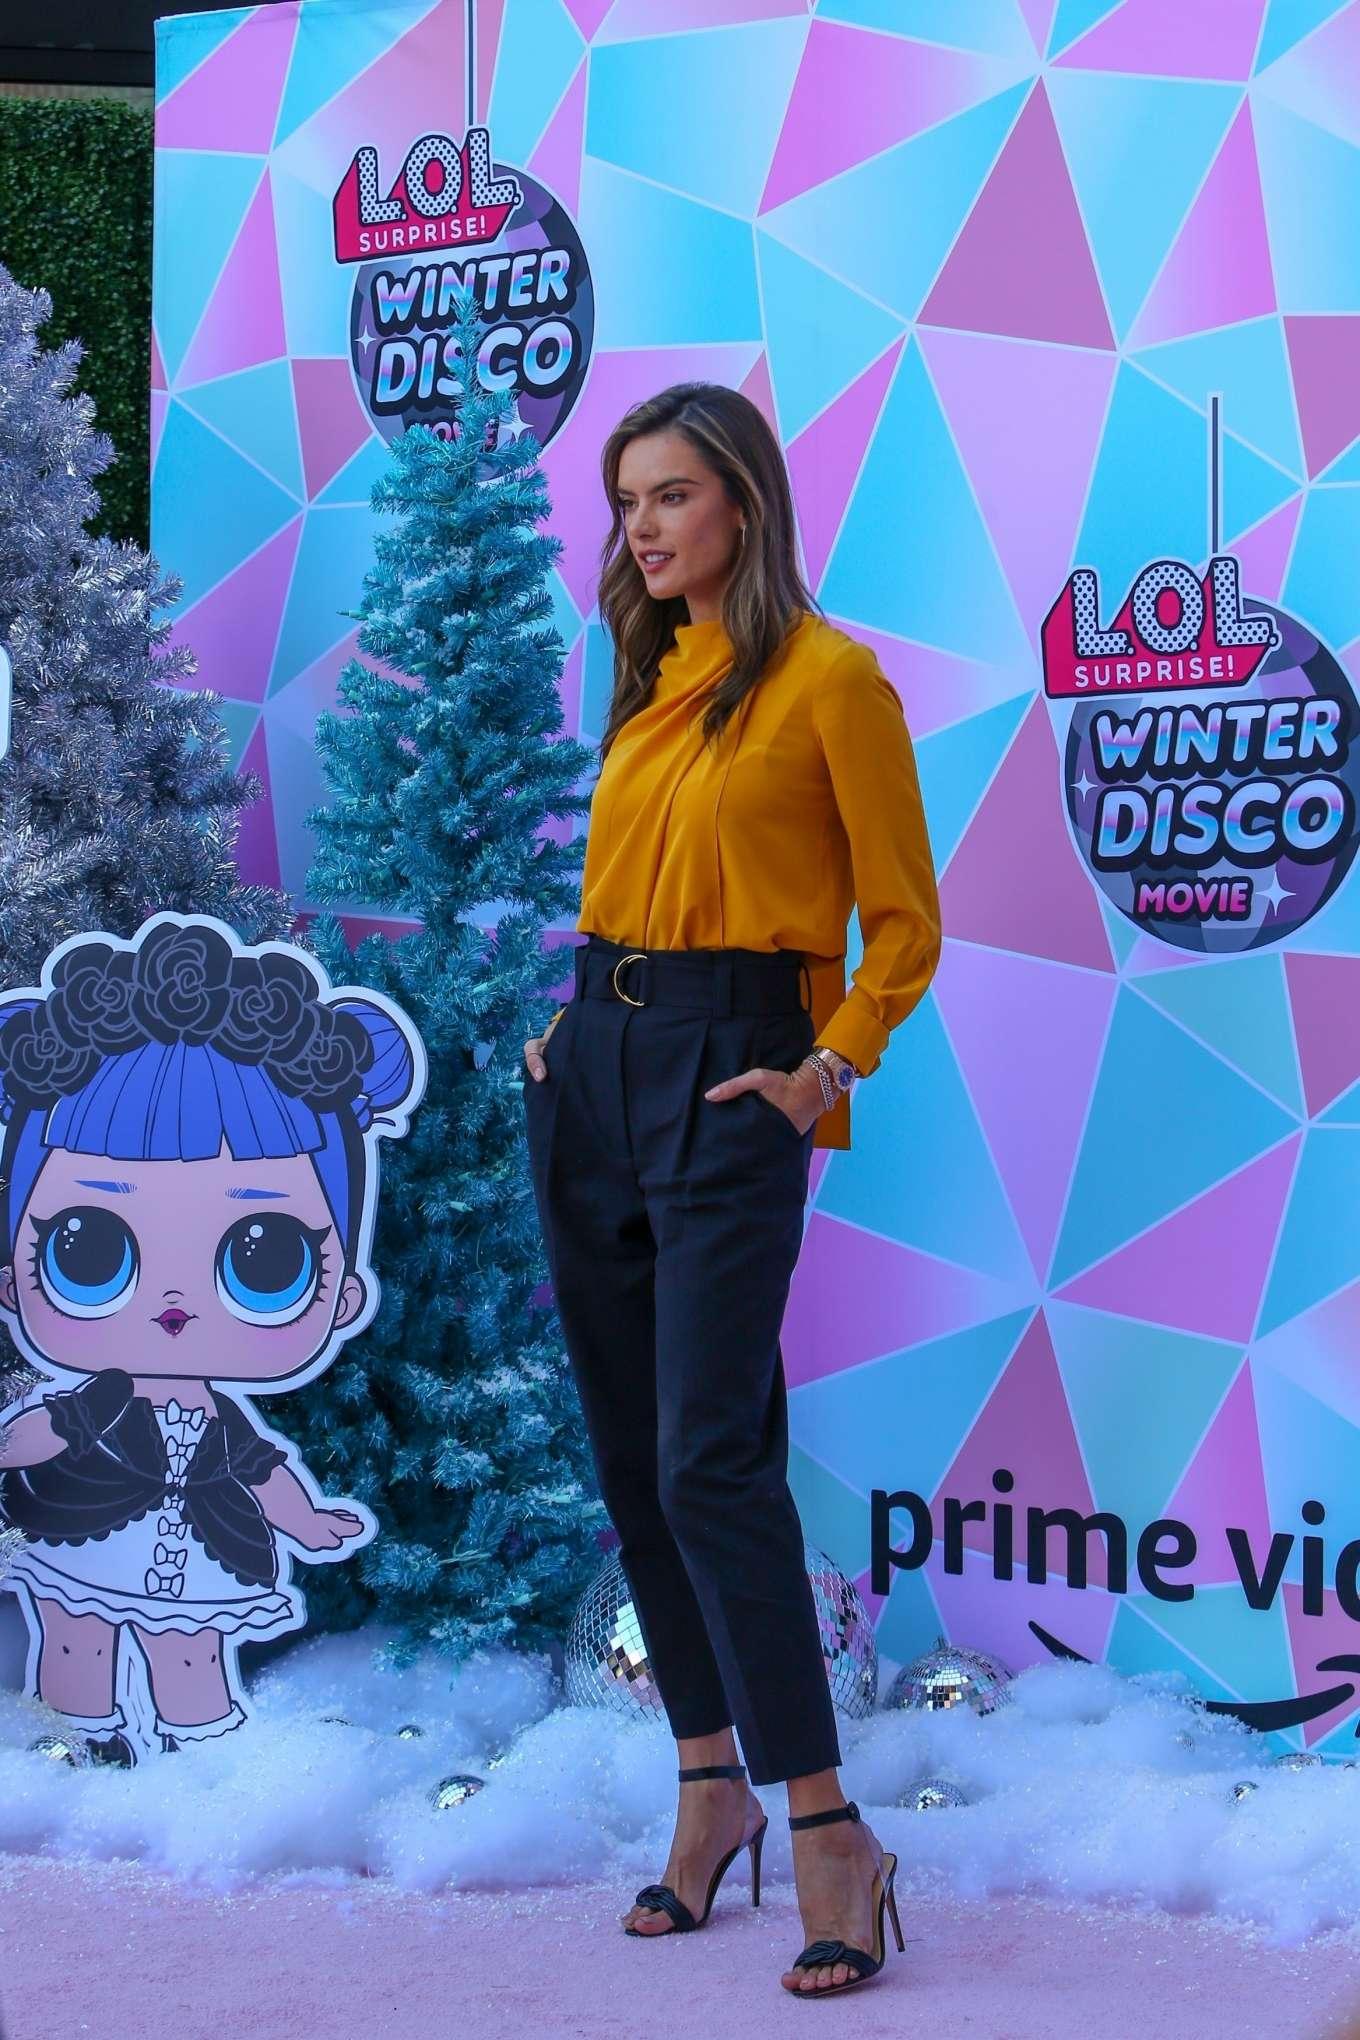 Alessandra Ambrosio 2019 : Alessandra Ambrosio – Amazons LOL Surprise Winter Disco movie-12